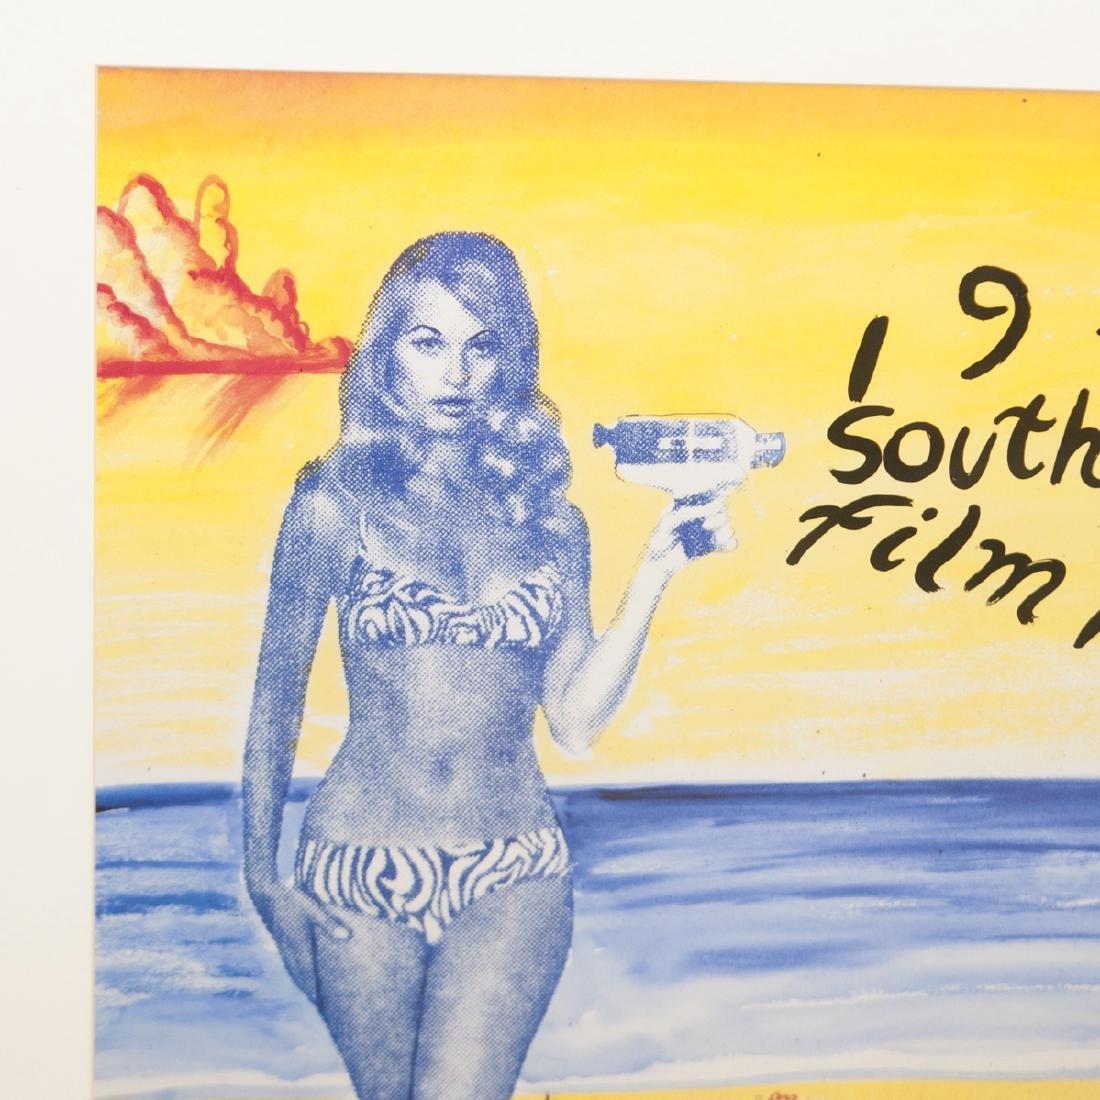 1995 South Beach Film Festival Poster - 2